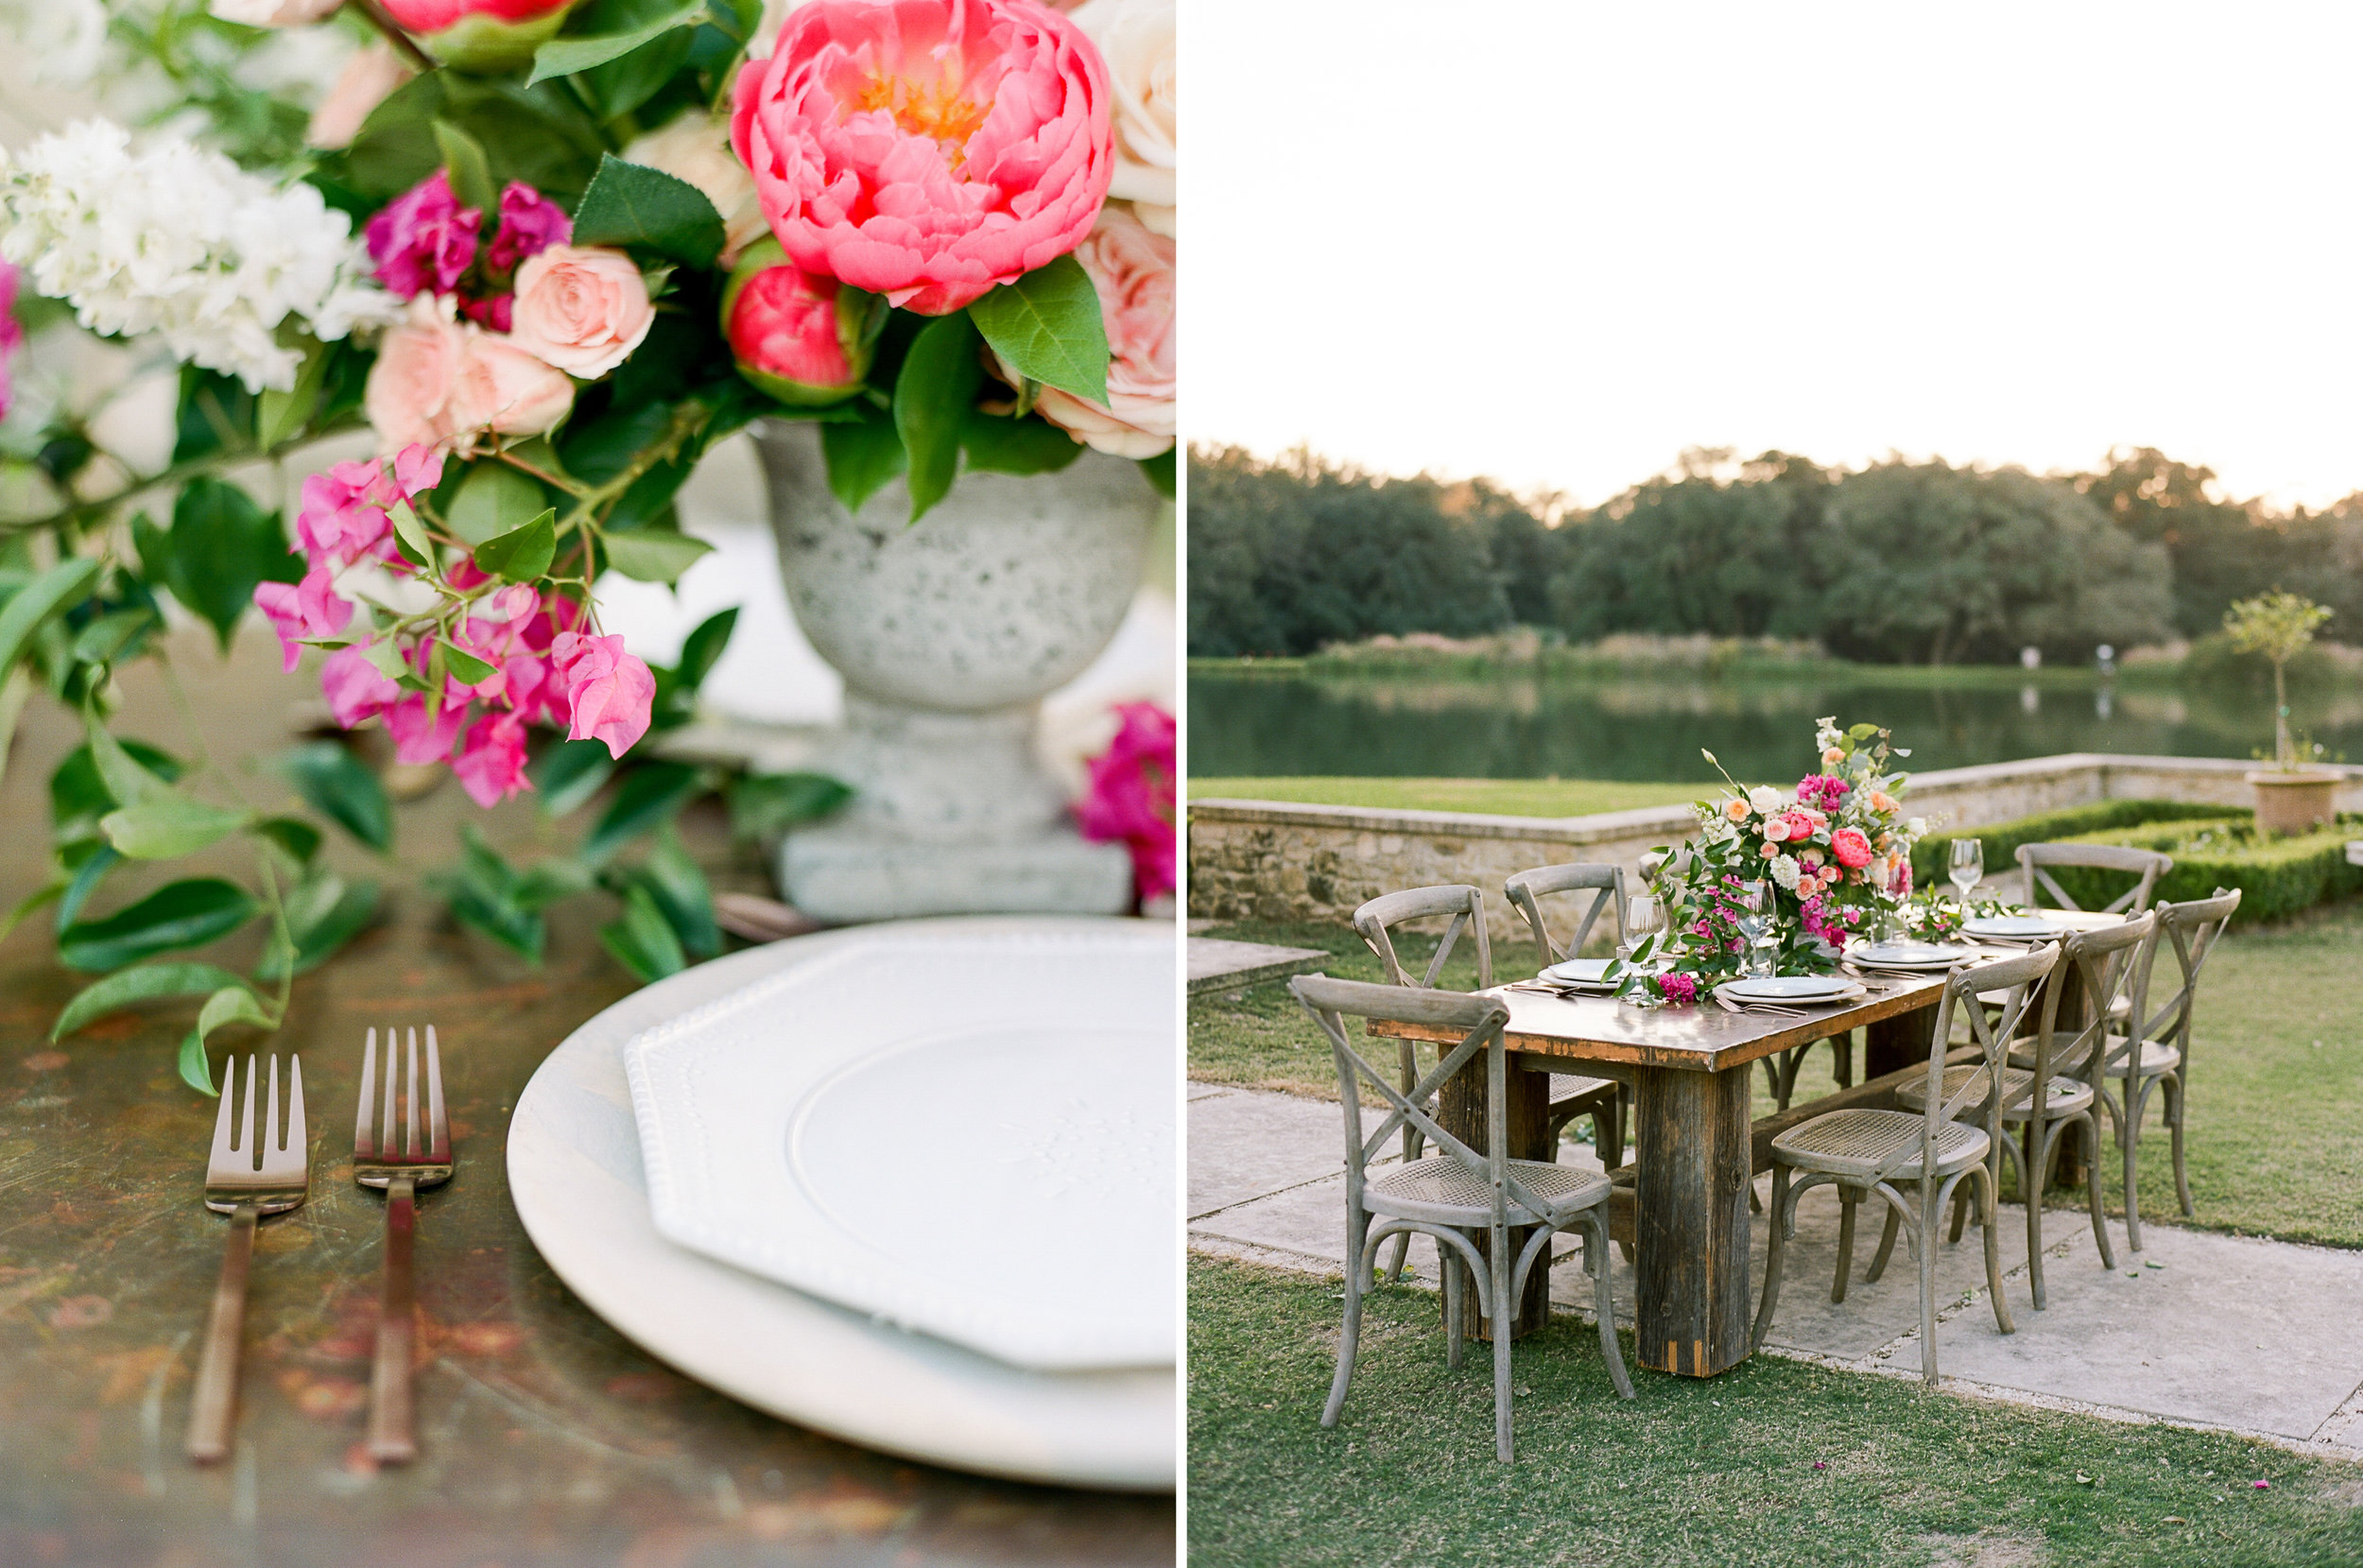 Top-Houston-Wedding-Photographer-Dana-Fernandez-Photography-The-Clubs-At-Houston-Oaks-Country-Club-Belle-Events-Film-Fine-Art-Destination-113.jpg